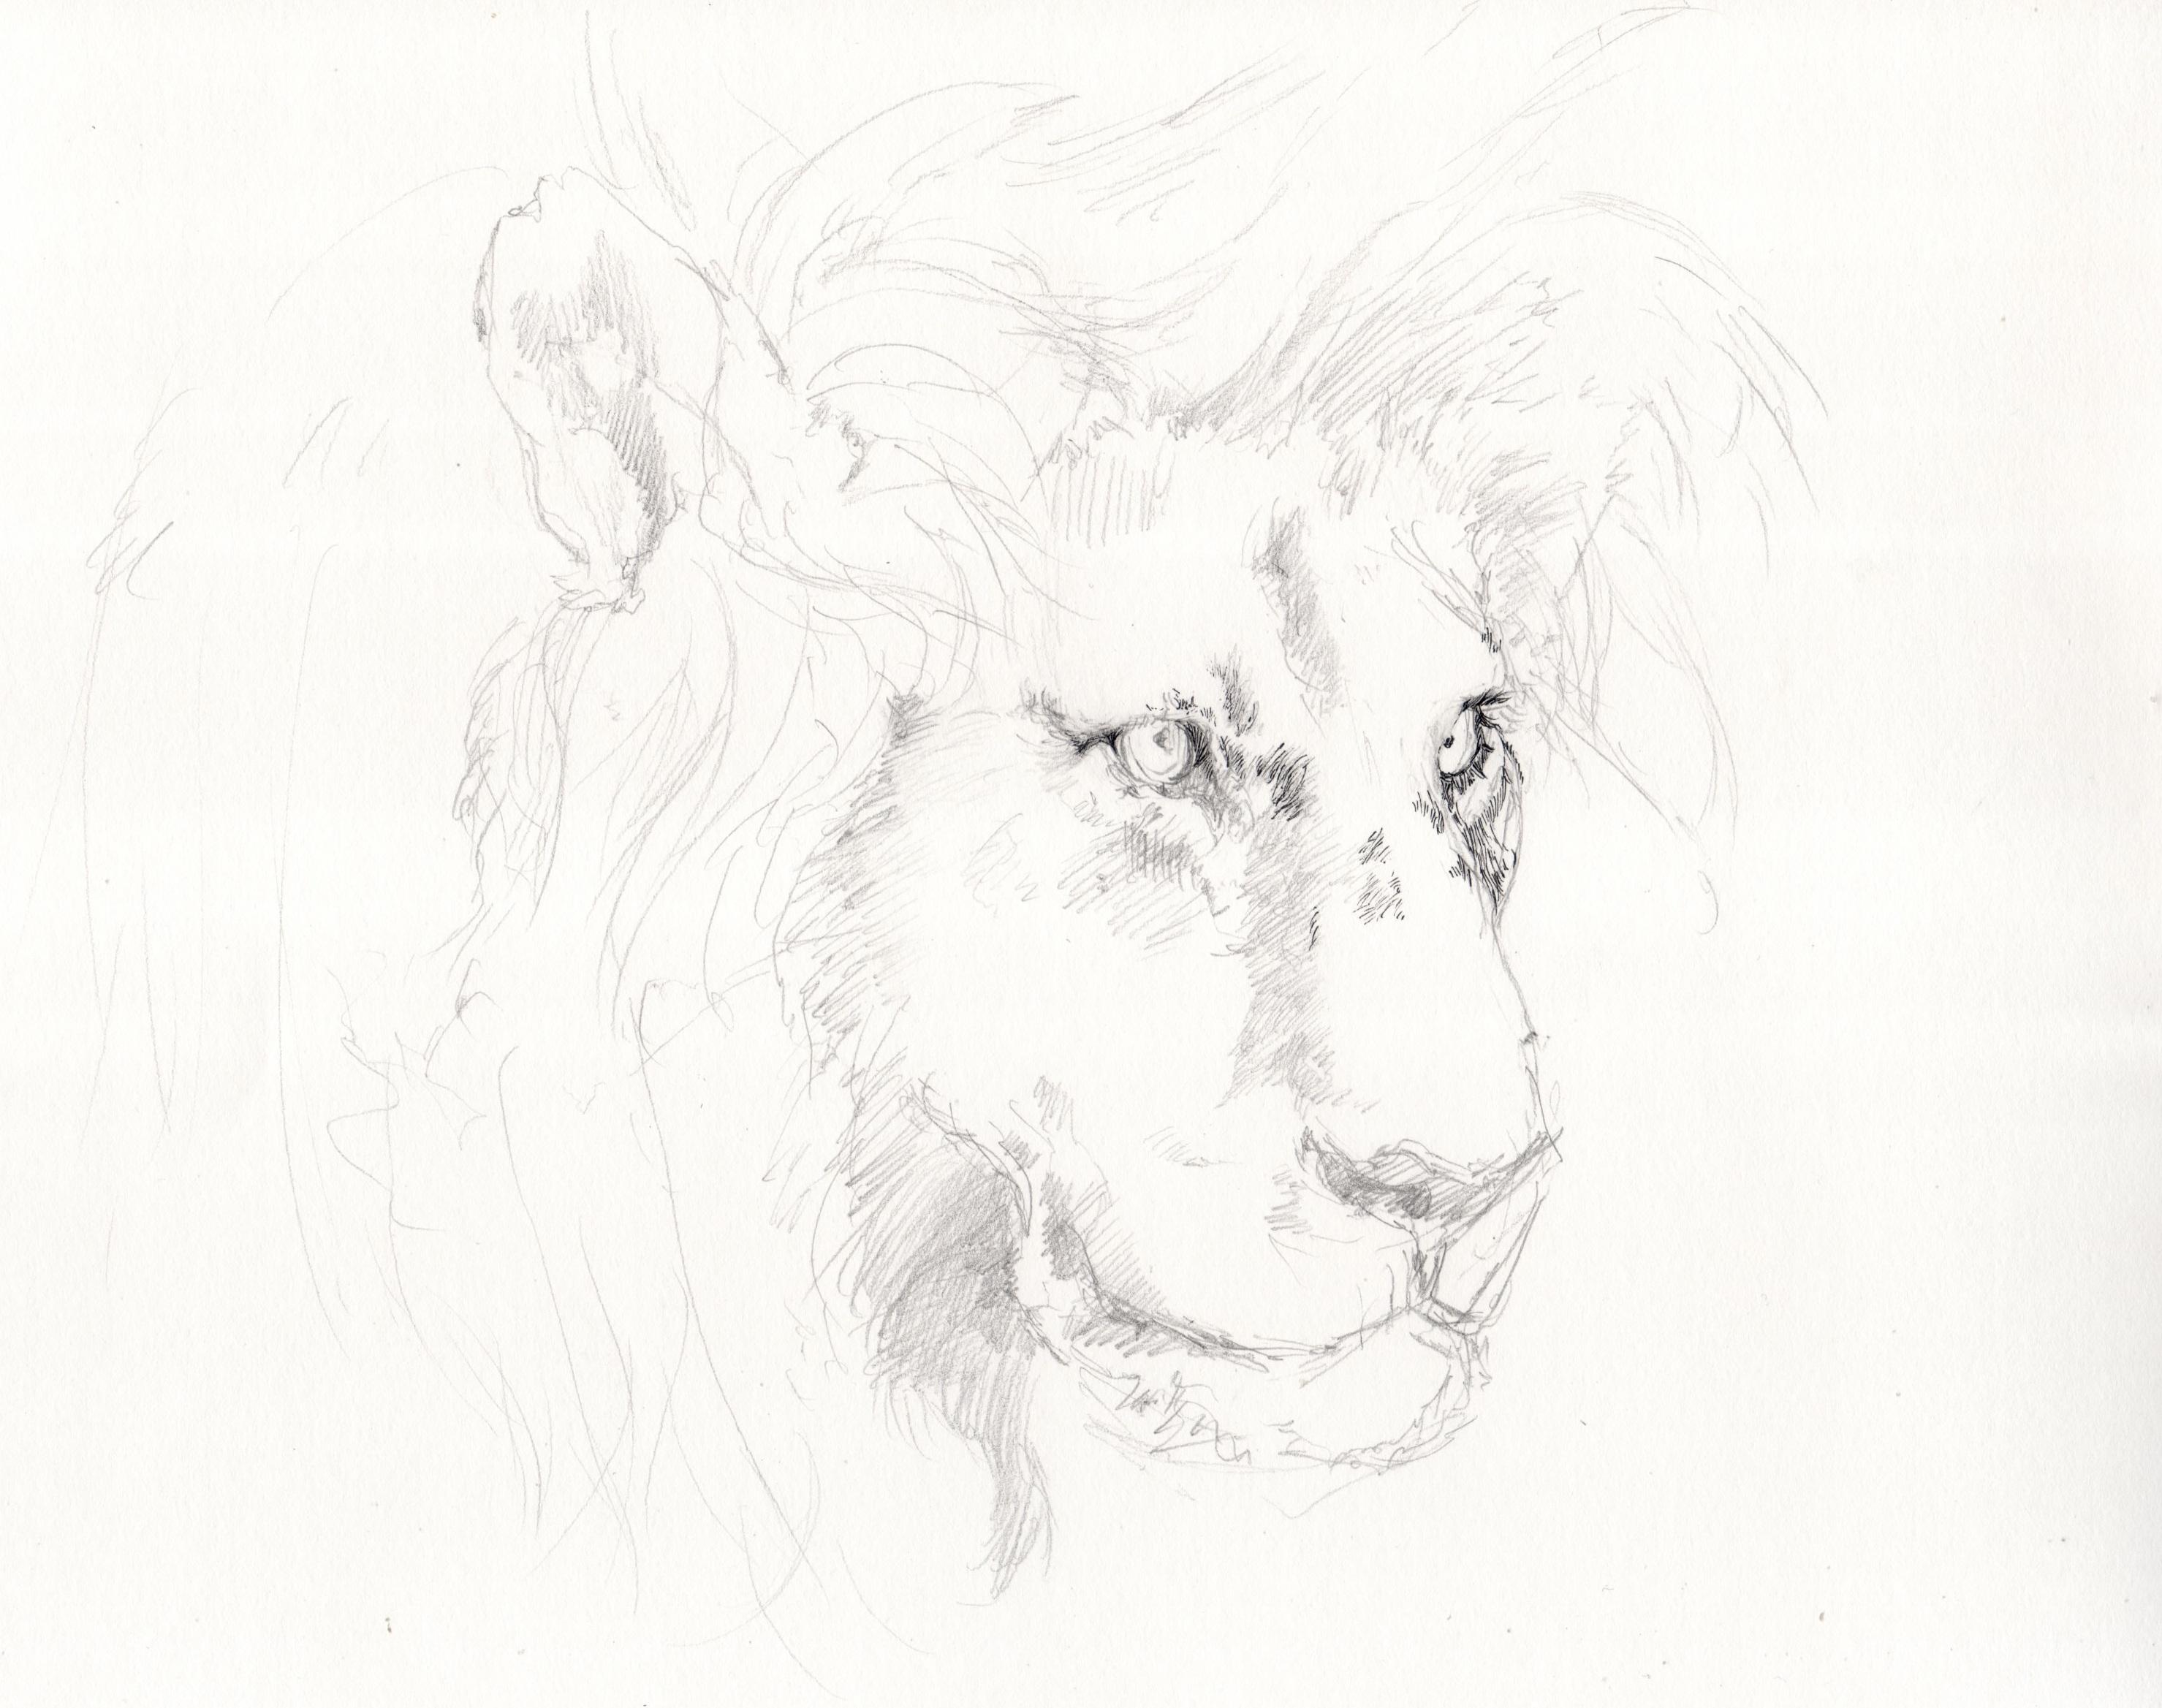 Gambar Hitam Dan Putih Singa Karya Seni Sketsa Ilustrasi